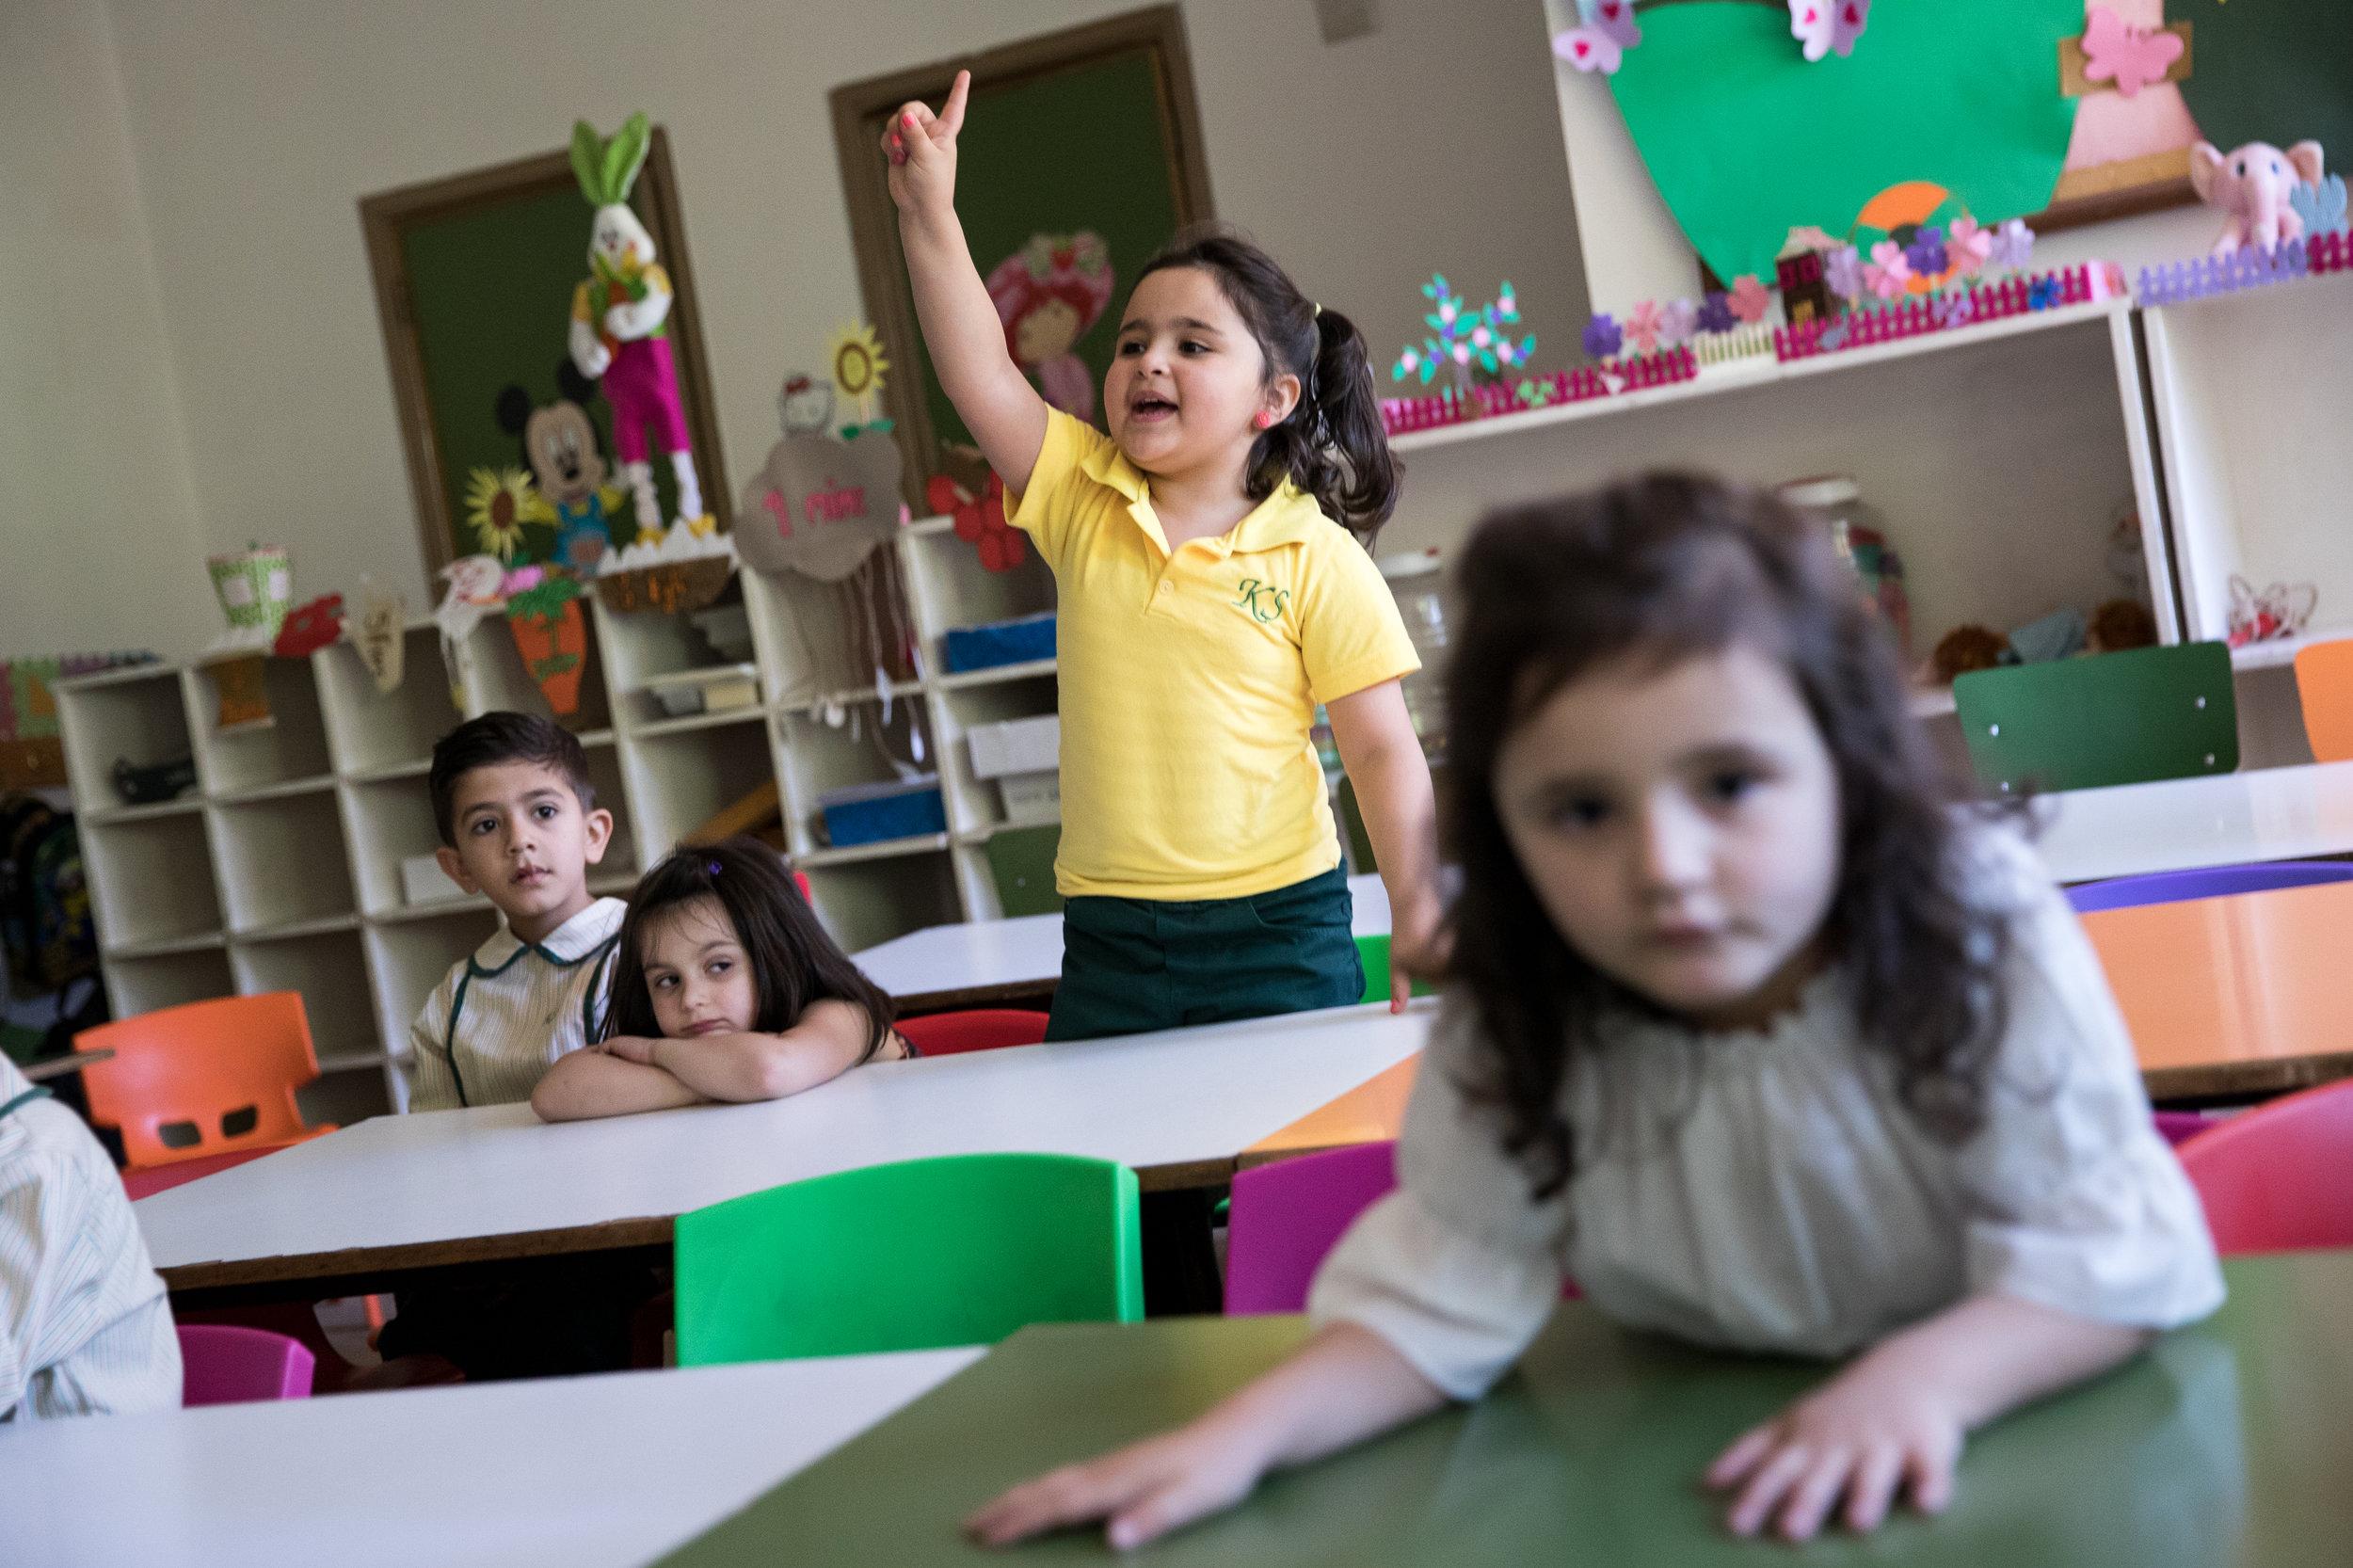 2018-06-20_Rasha Rafai 23, Childhood Education at Al Kayrawan, Bekaa, LEB_0045.jpg